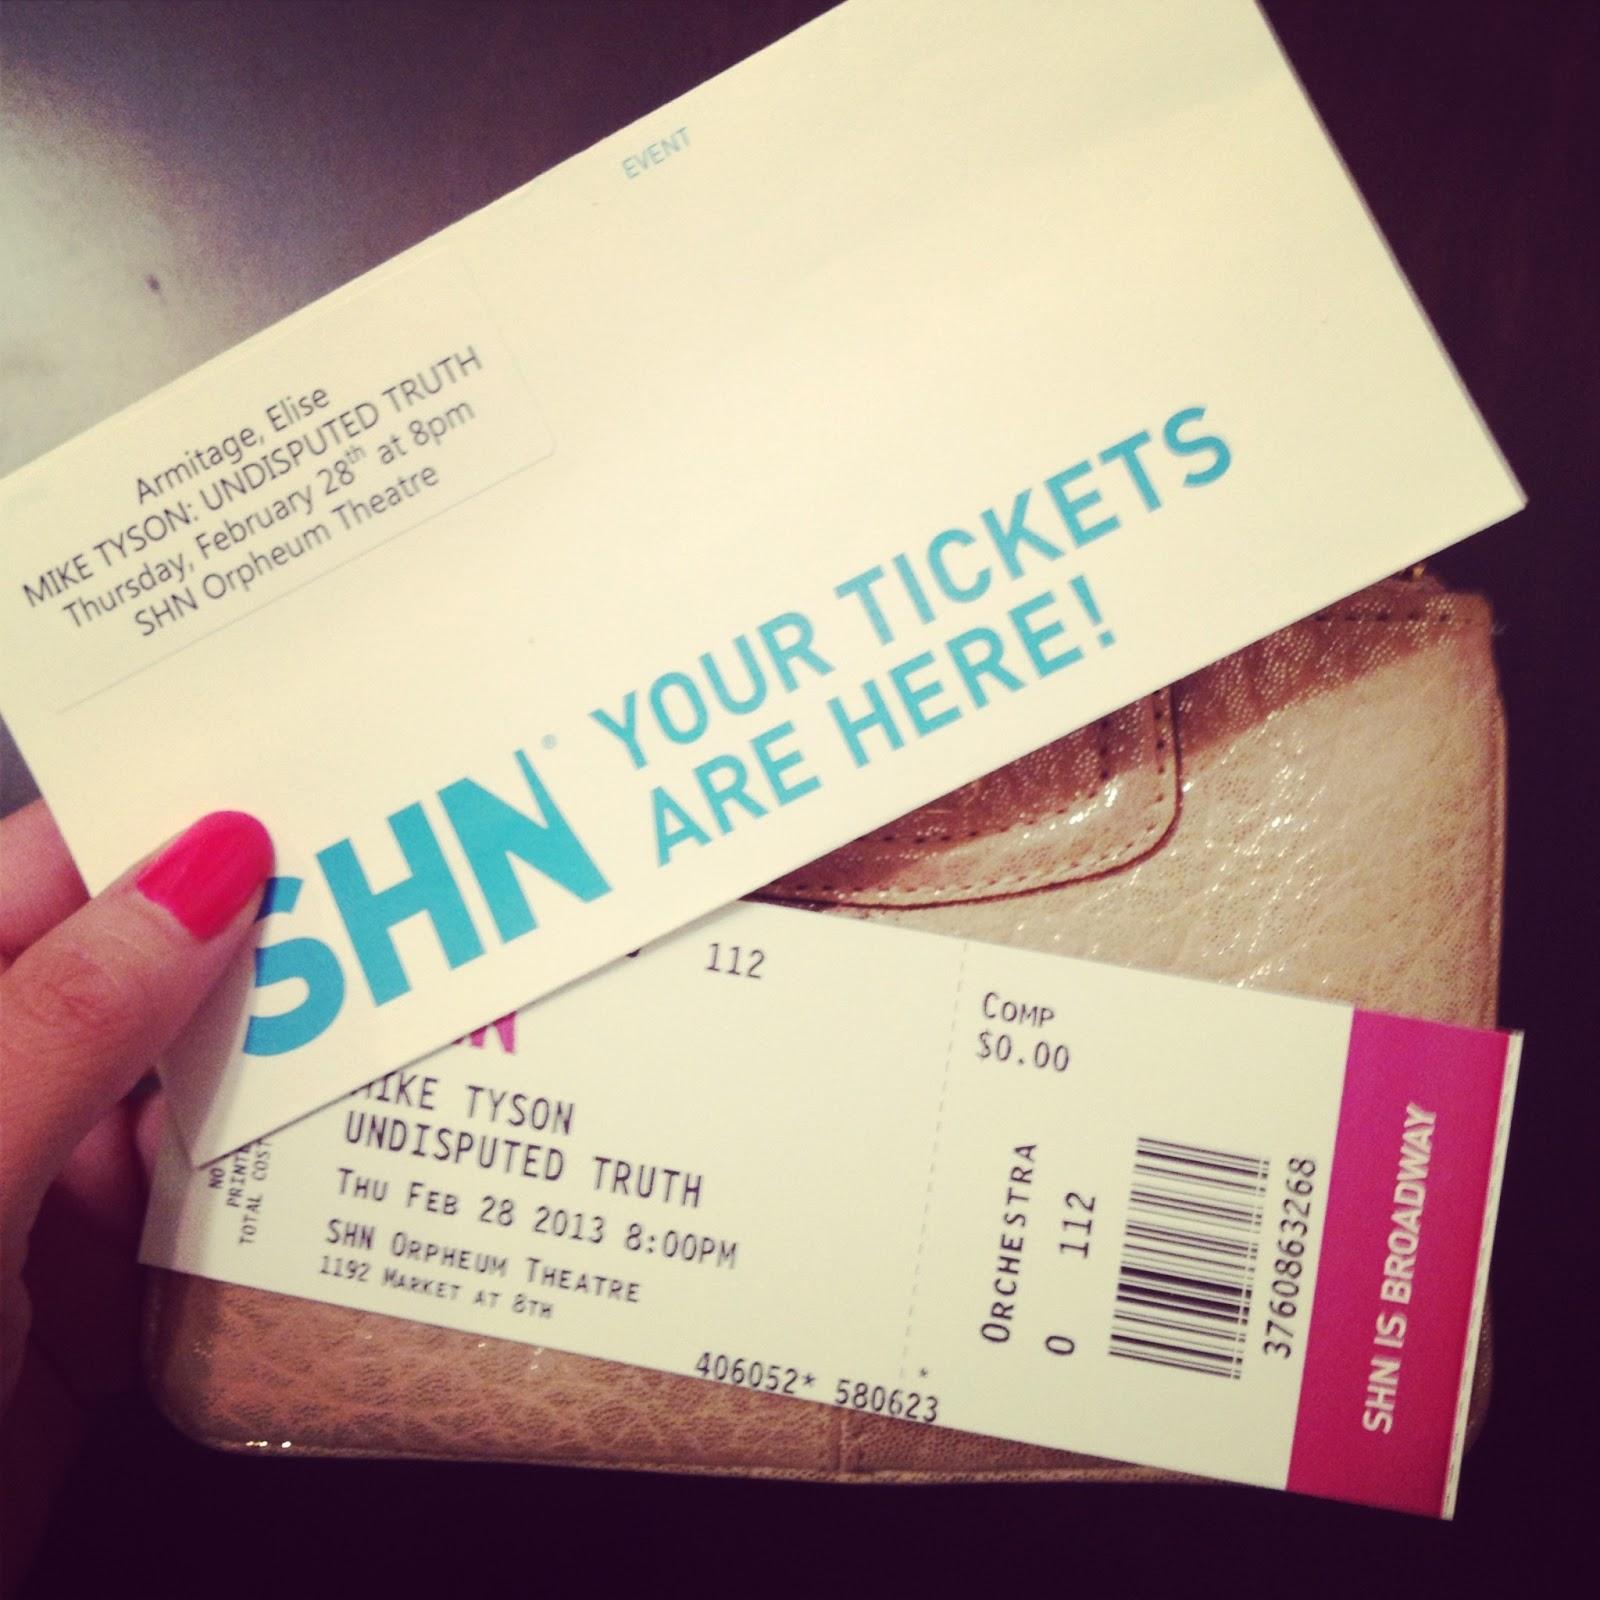 http://1.bp.blogspot.com/-Spz6tp3NnkM/UTBU7o6zyjI/AAAAAAAAE4E/y2ubLU-QpT4/s1600/SHN-Mike-Tyson-tickets.JPG